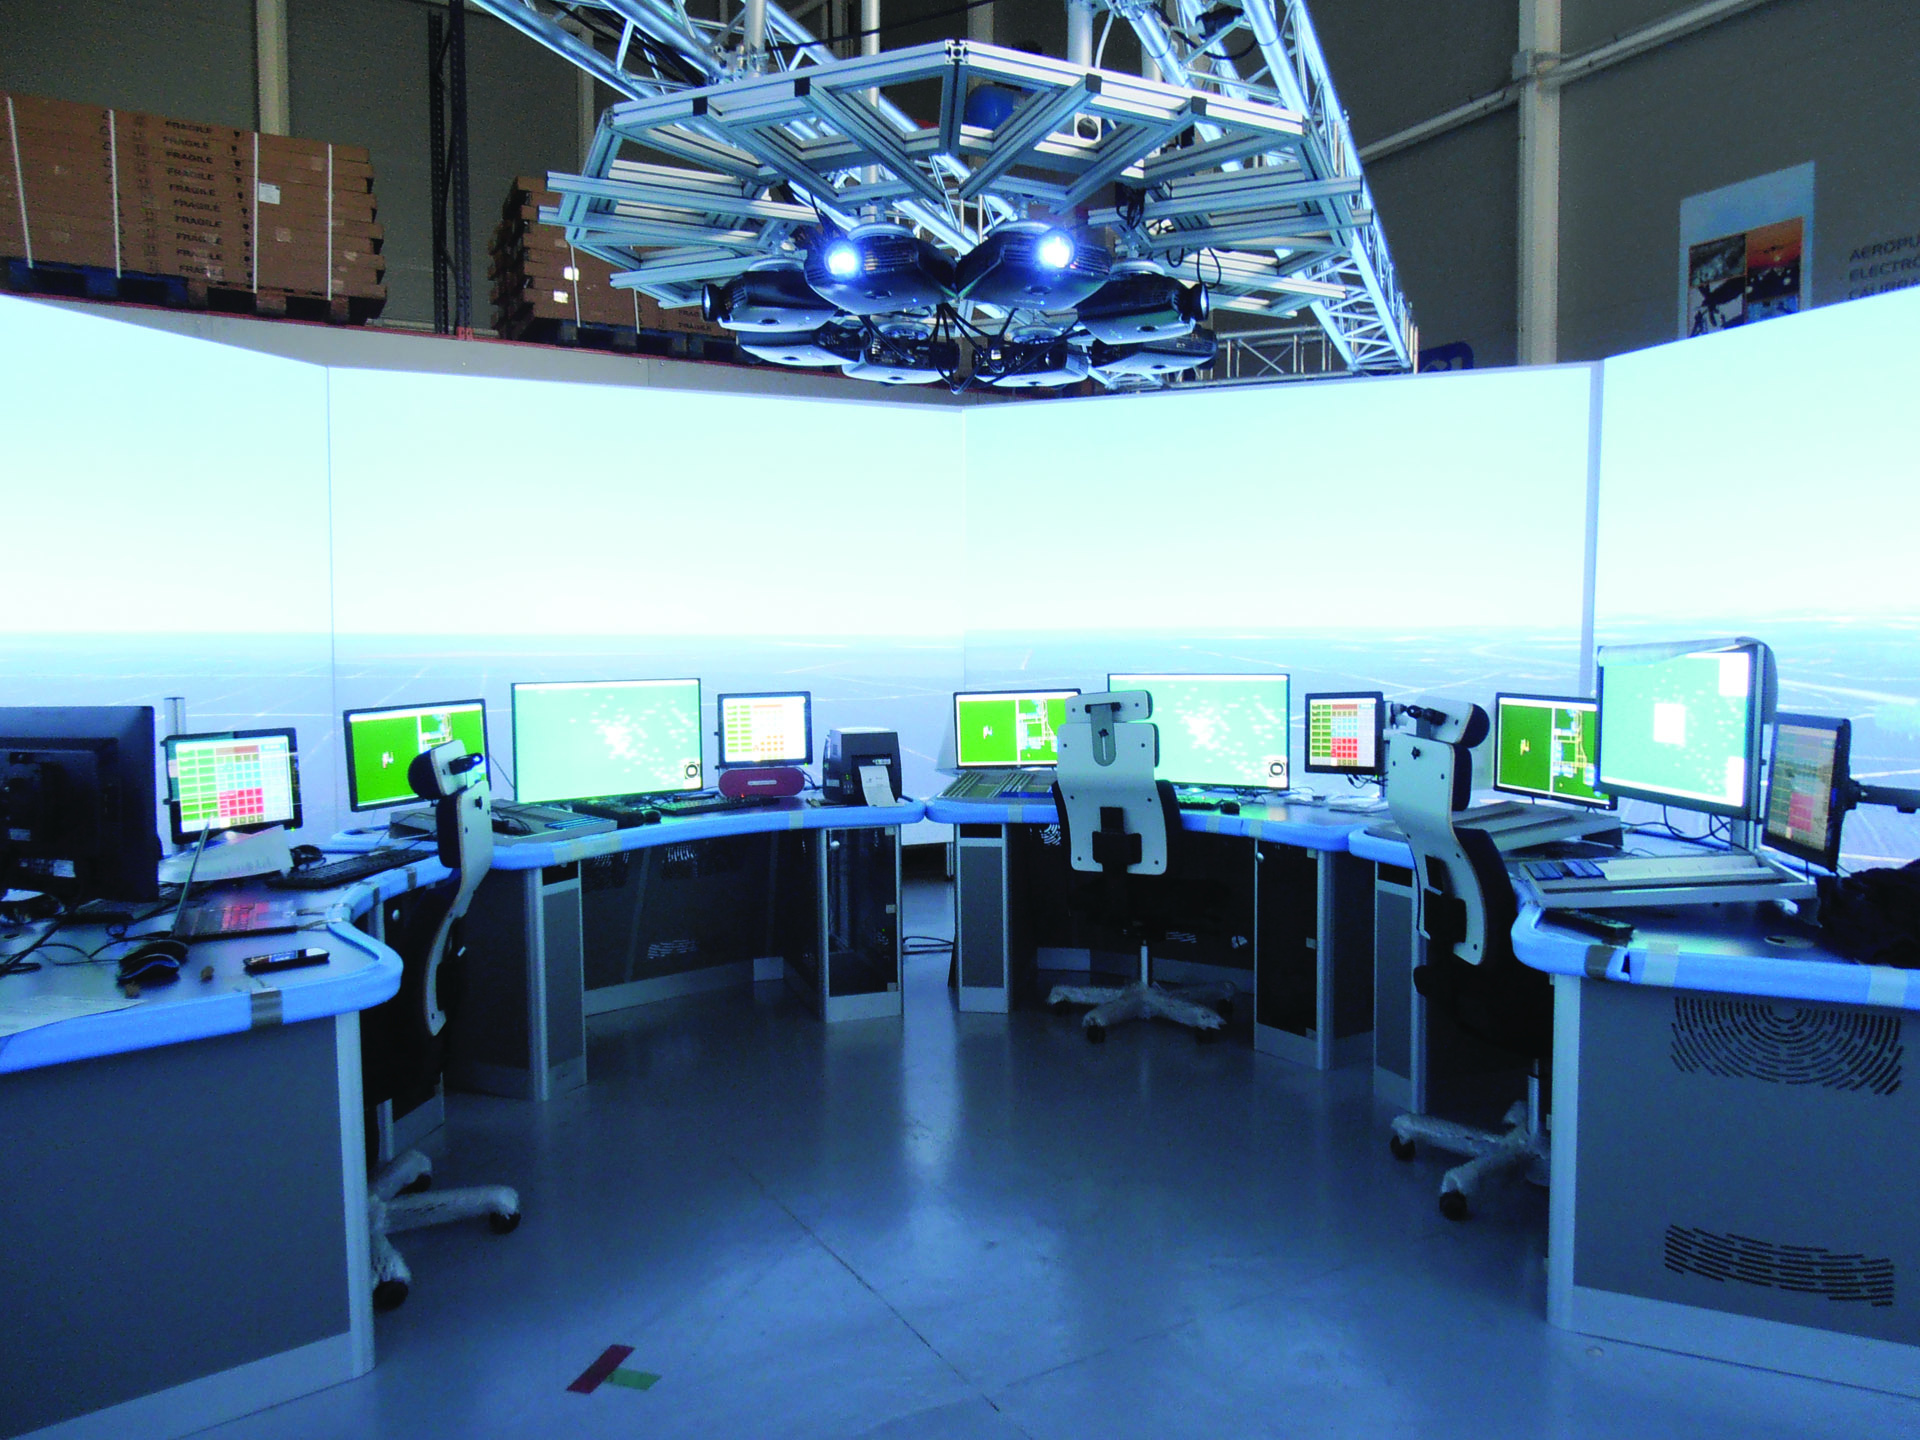 tower simulator example